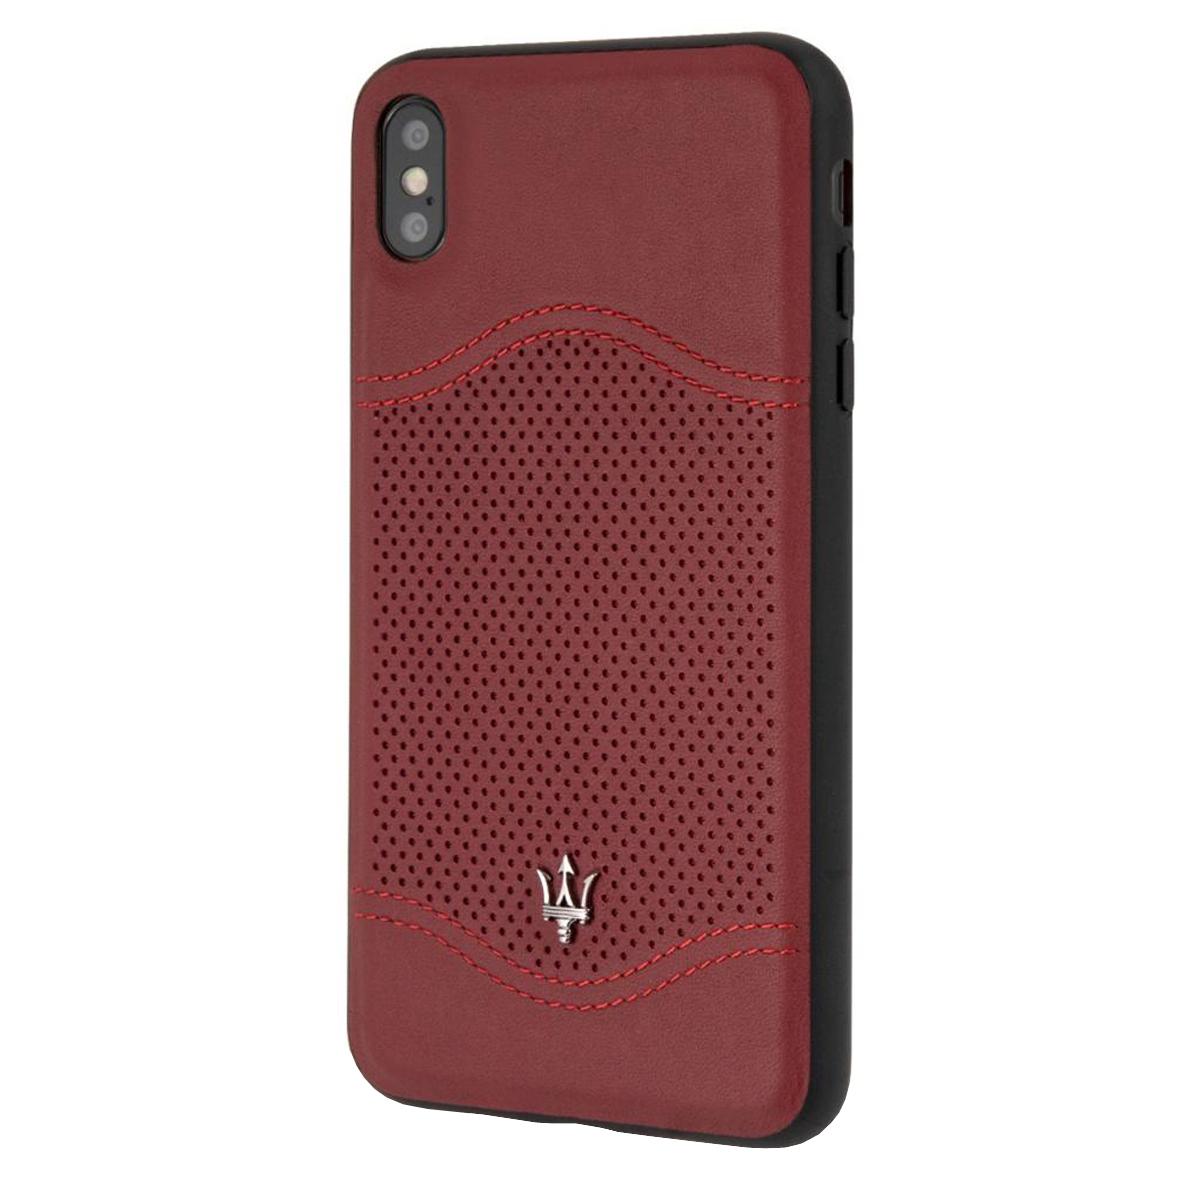 کاور   سی جی موبایل کد 33301 مناسب برای گوشی موبایل اپل iphone xs max    thumb 2 1